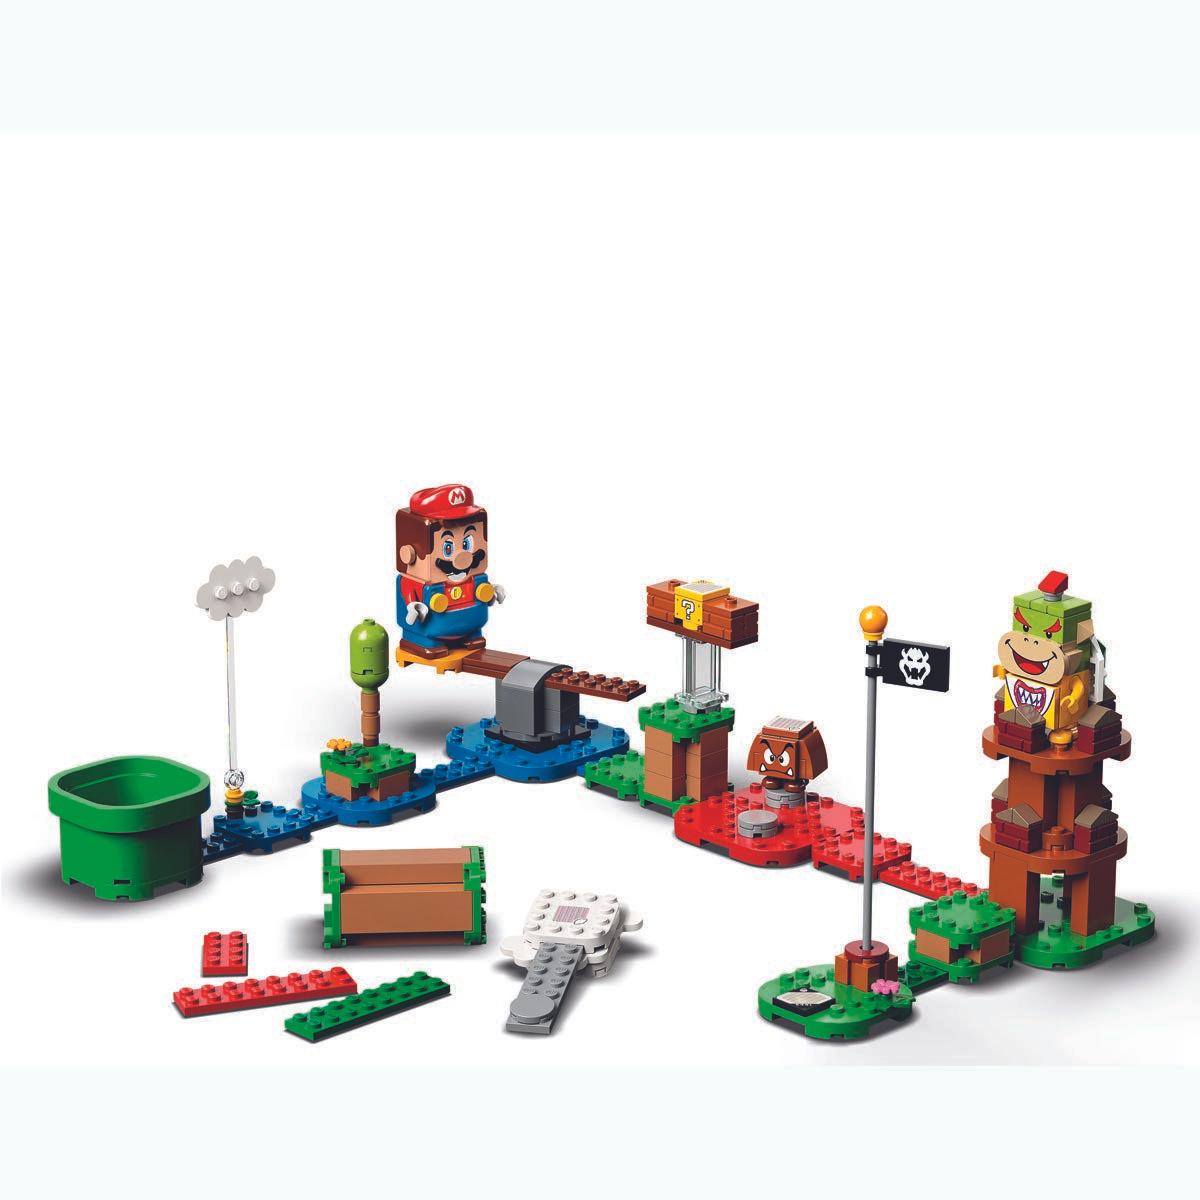 Lego Mario Set inc Free Mini-Set (Pre-Order) £42.50 & Free Delivery at TheToyShop.com (The Entertainer)